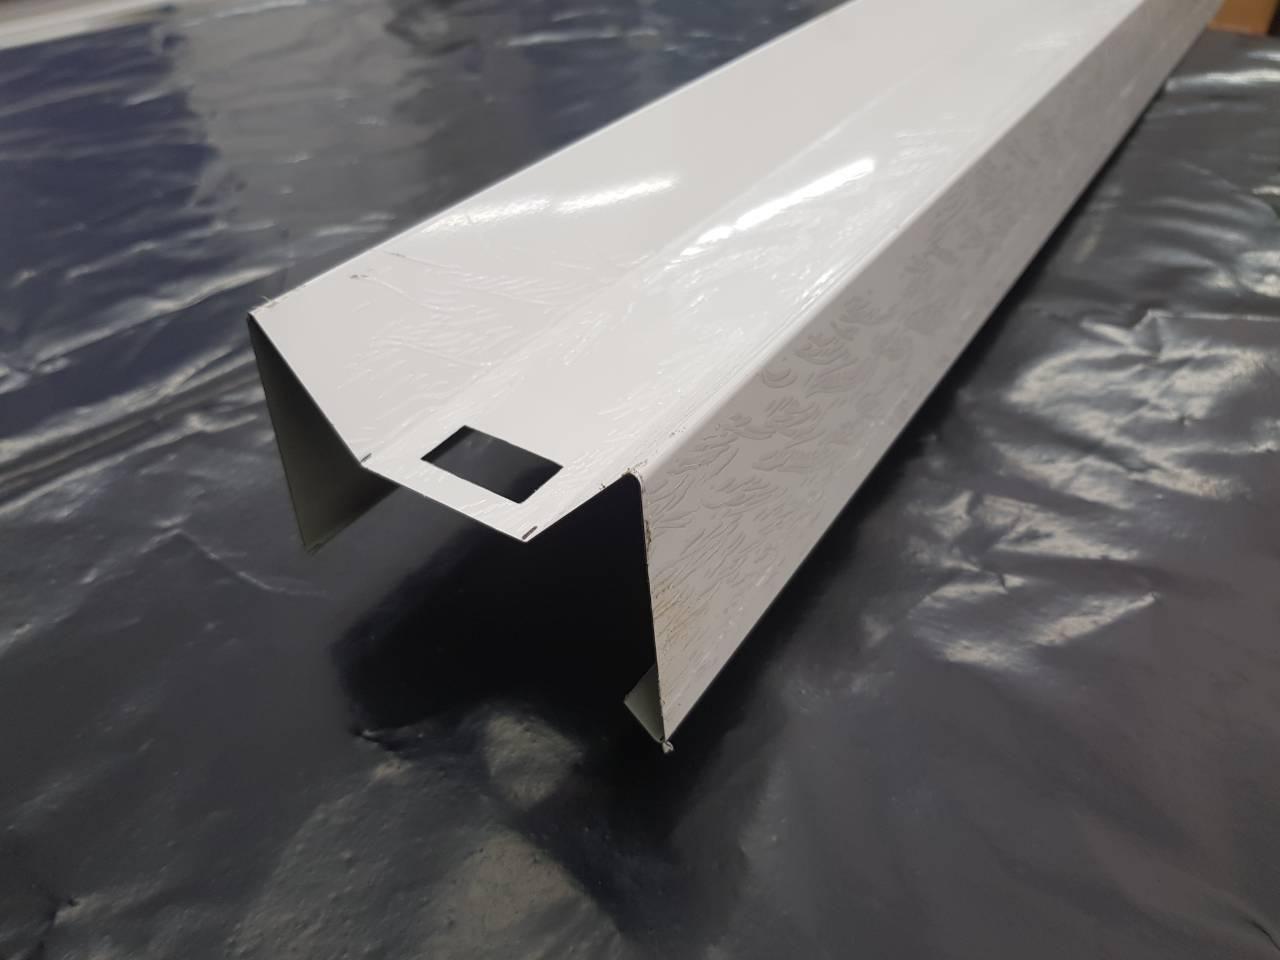 Светильник магистральный LINE150/1 1,5м (под LED лампу T8) 1x1500мм Белый УКРАИНА металл